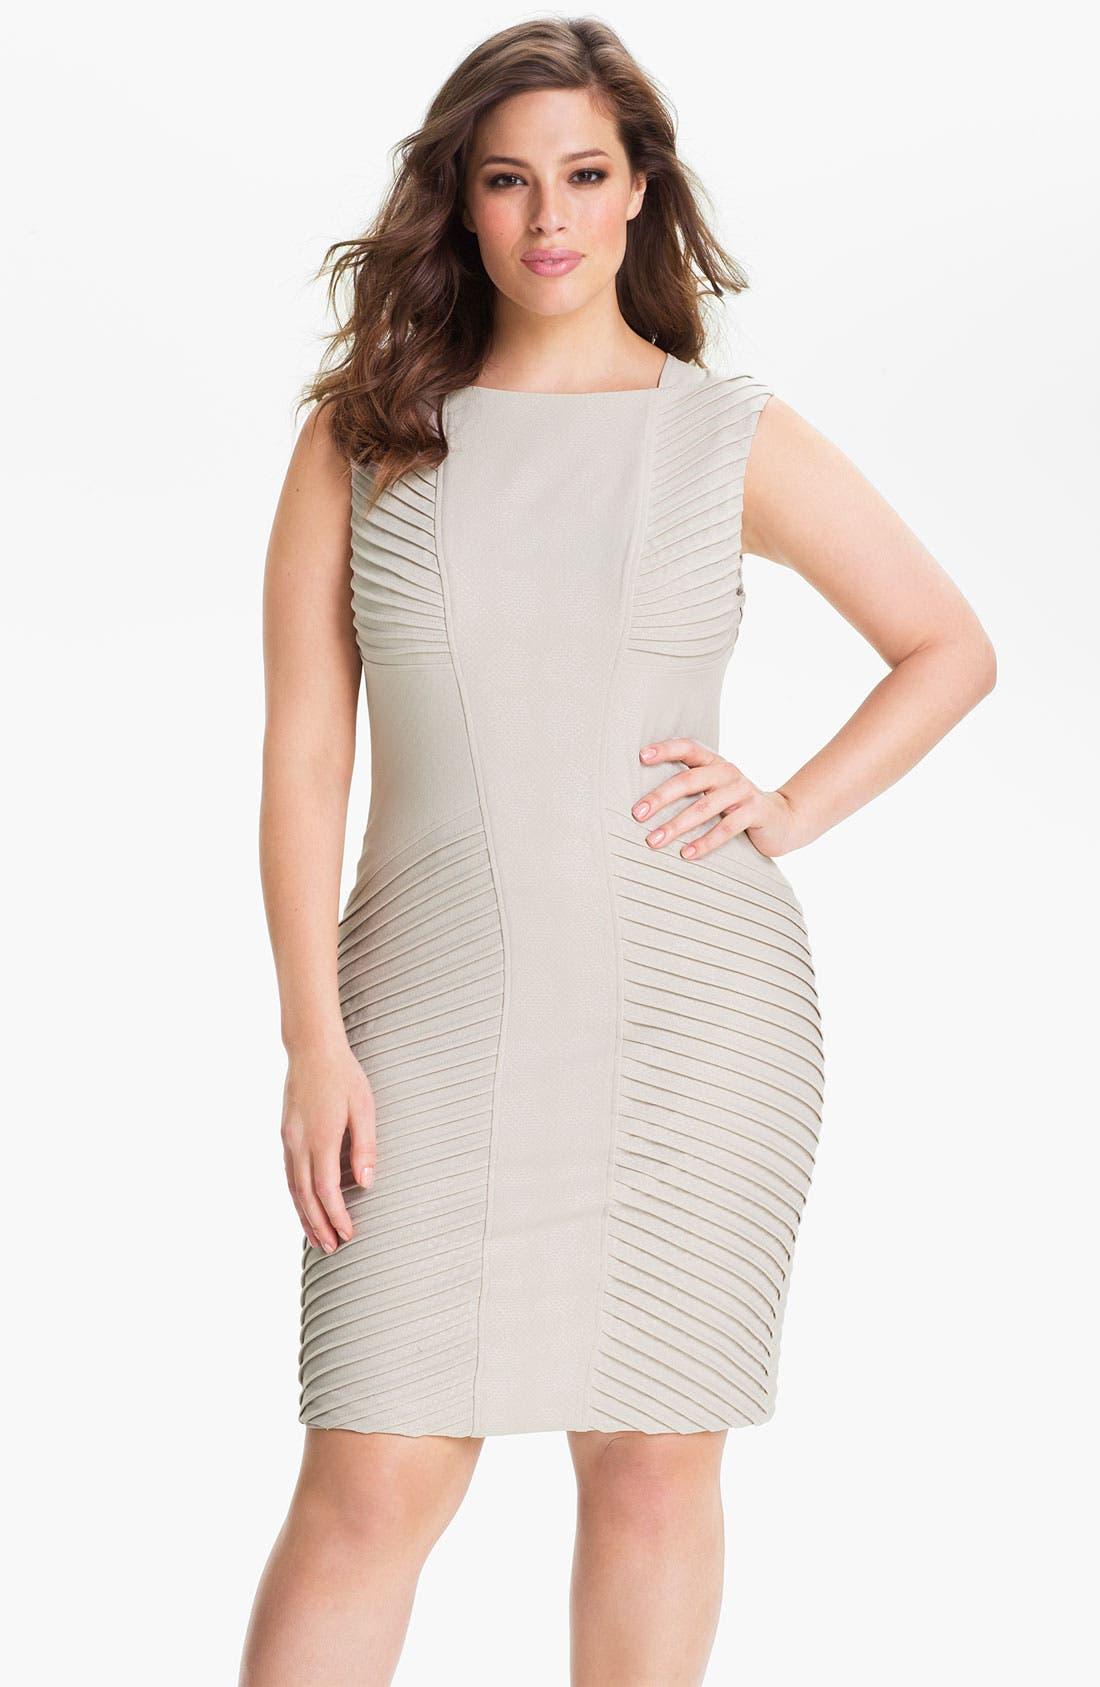 Alternate Image 1 Selected - Adrianna Papell Sleeveless Tucked Sheath Dress (Plus)